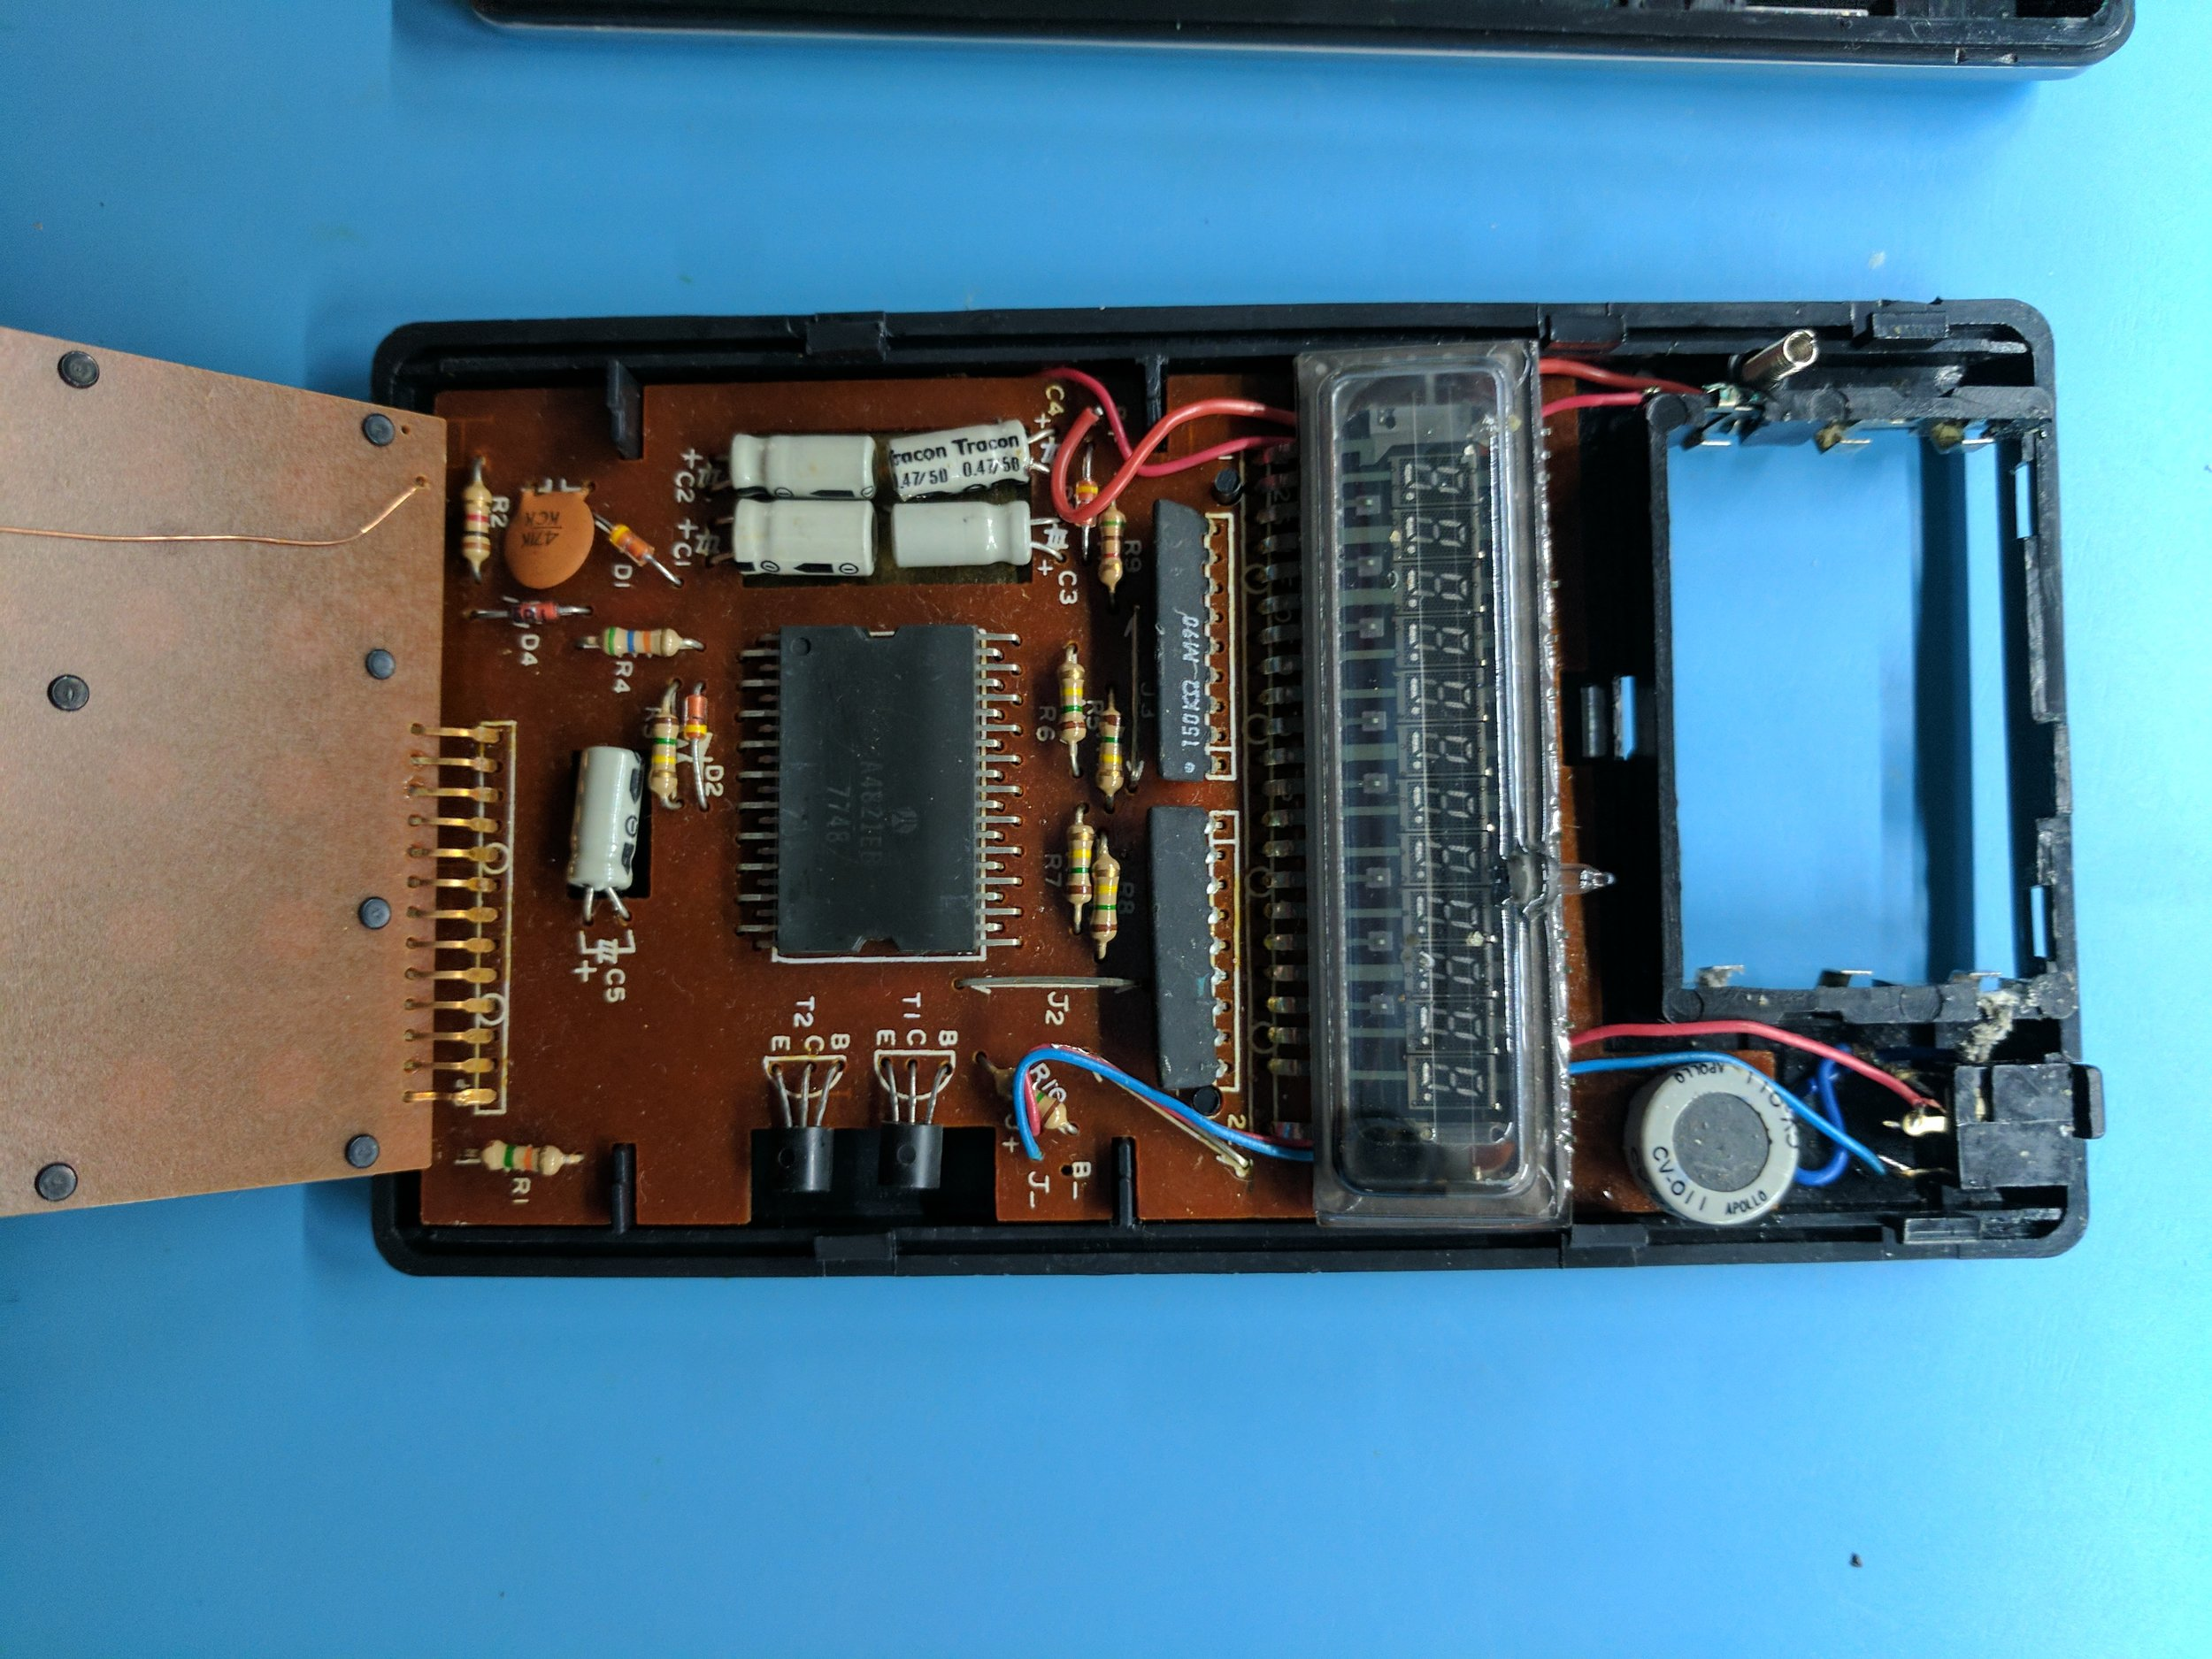 Reverse-engineering the 1977 Unisonic 21 calculator/game (part 1